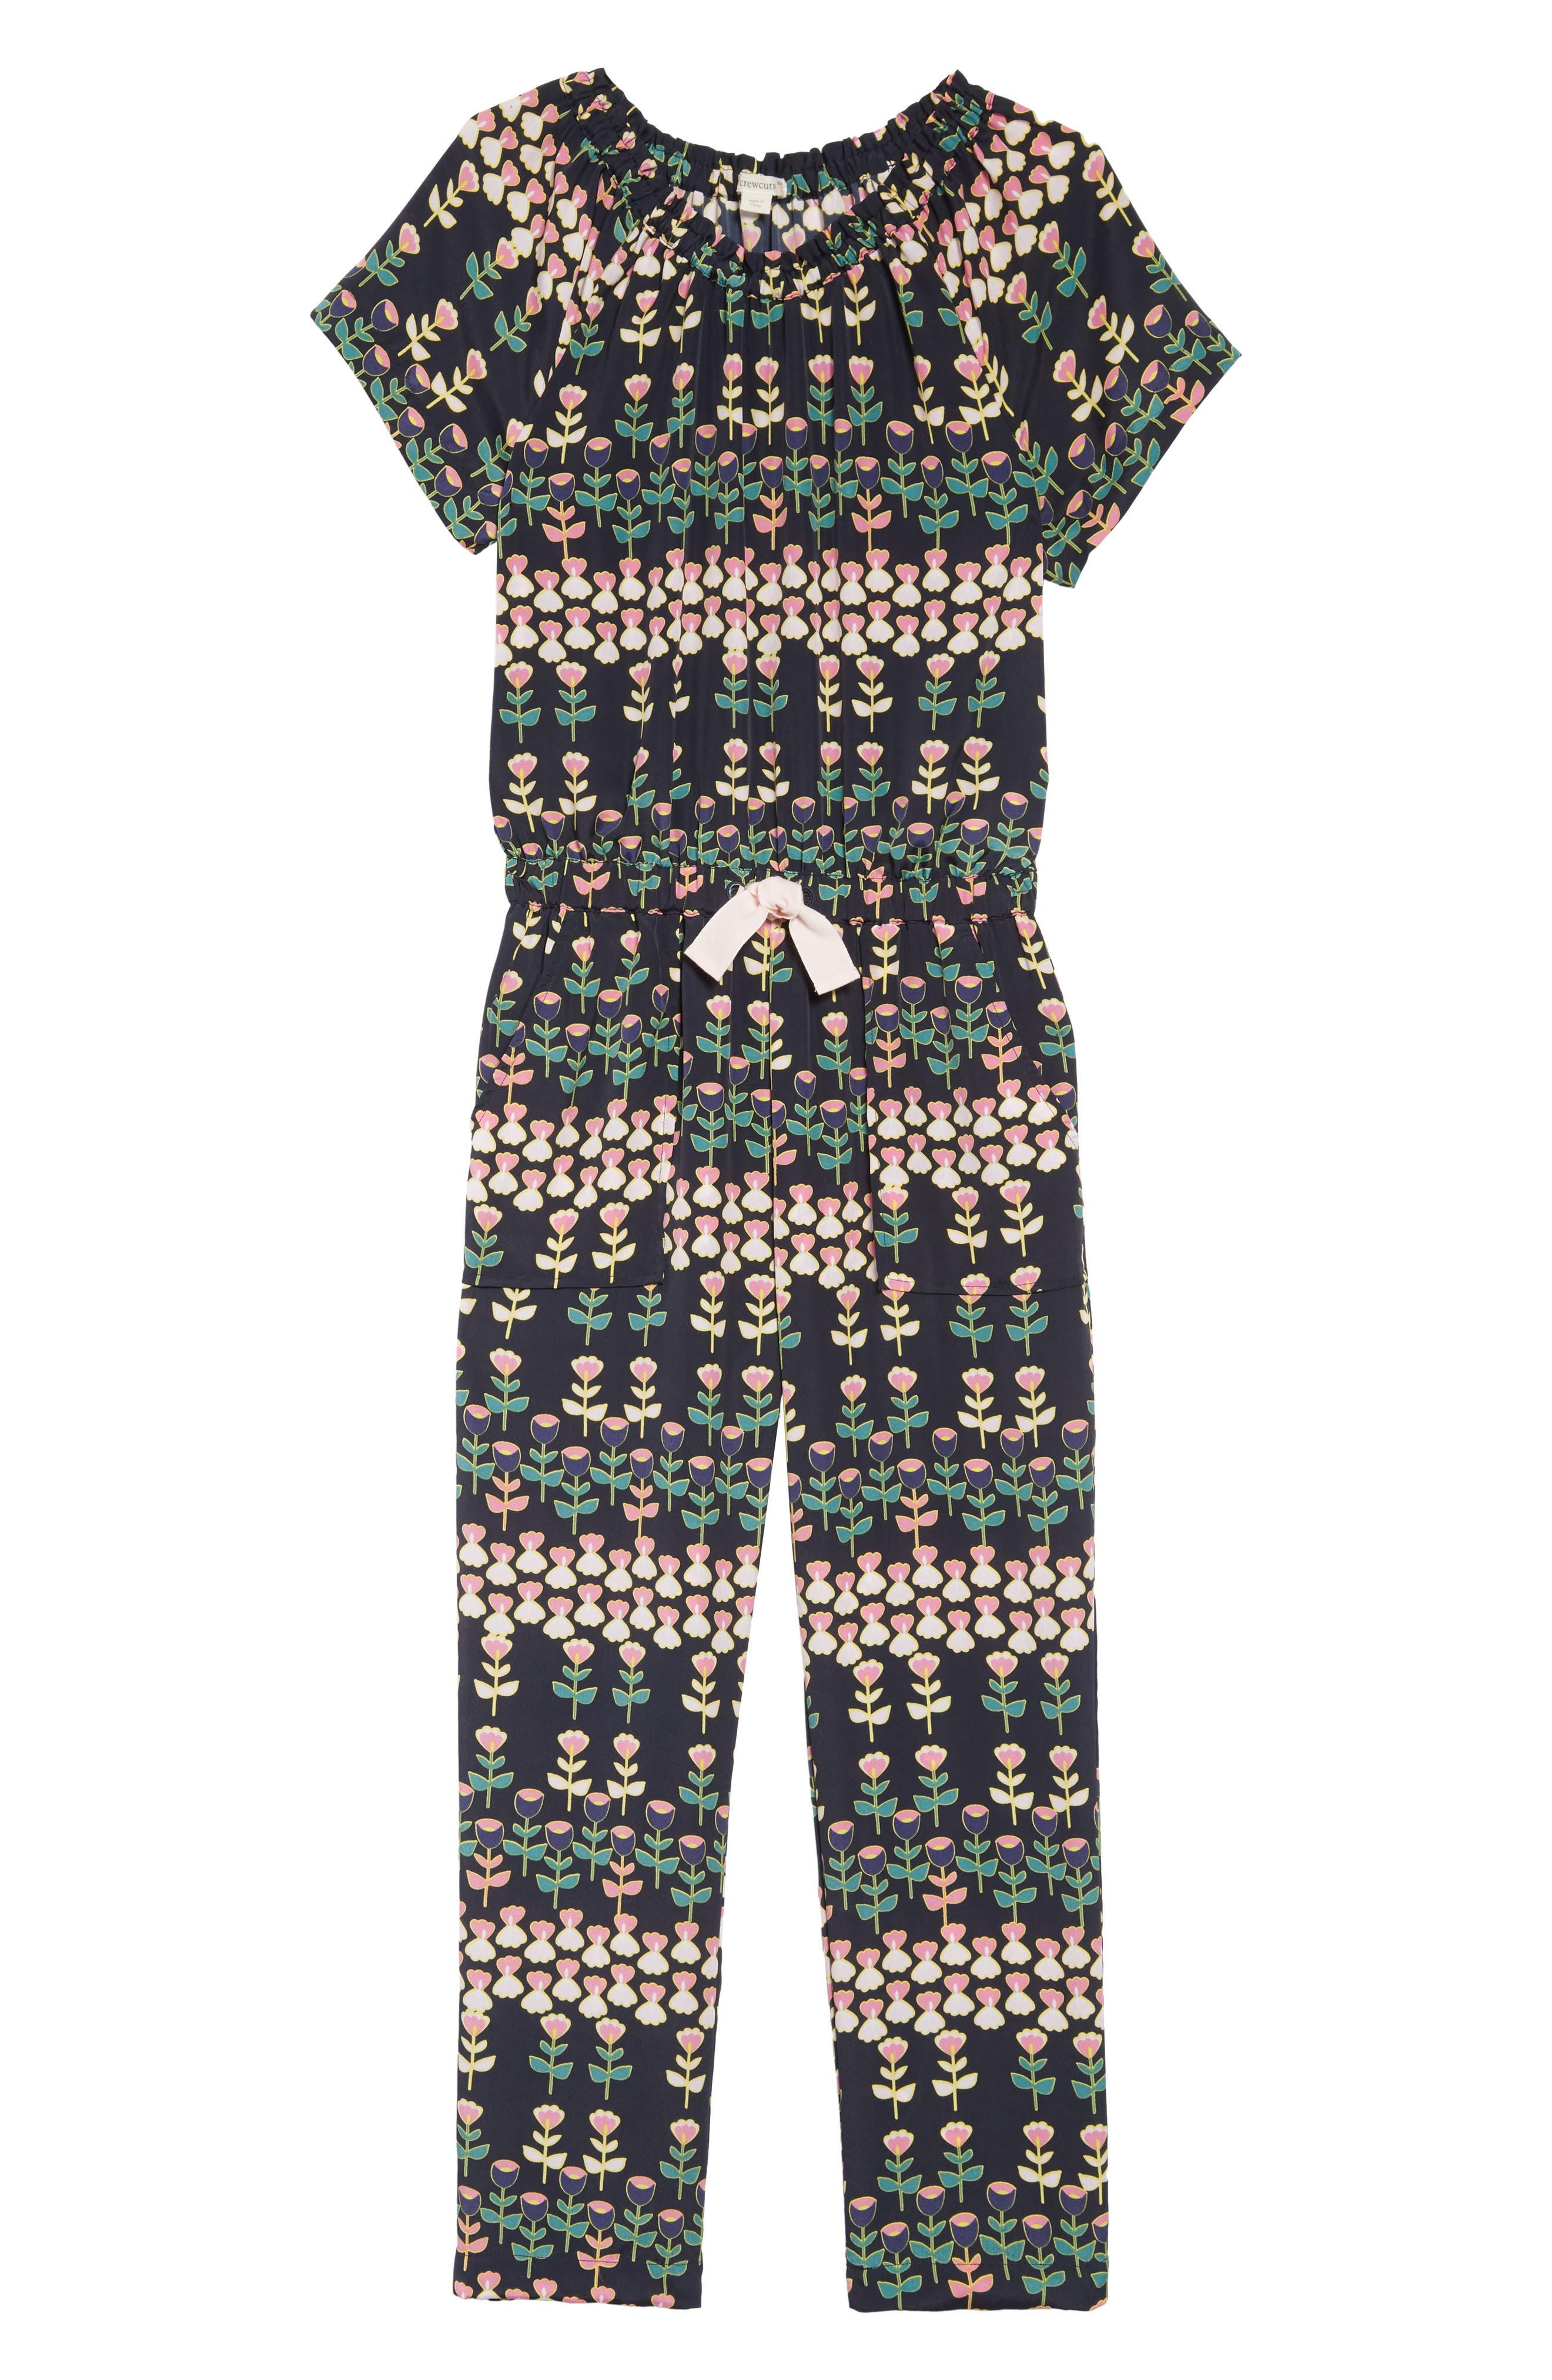 CREWCUTS BY J.CREW Naomi Floral Print Jumpsuit, Main, color, 411